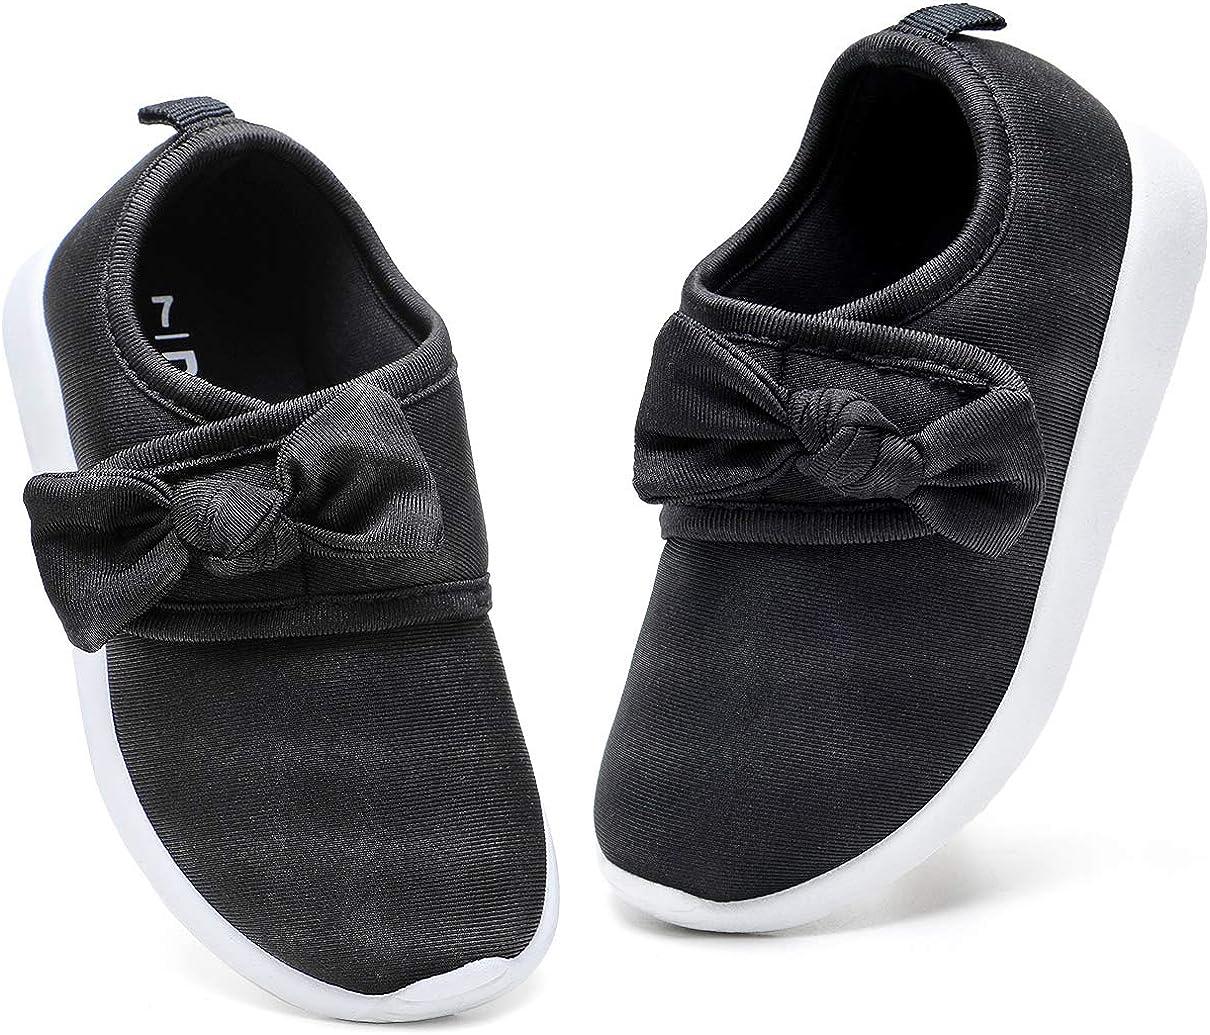 nerteo Toddler Girl Shoes Lightweight Sneakers On Kids Portland favorite Mall for Slip